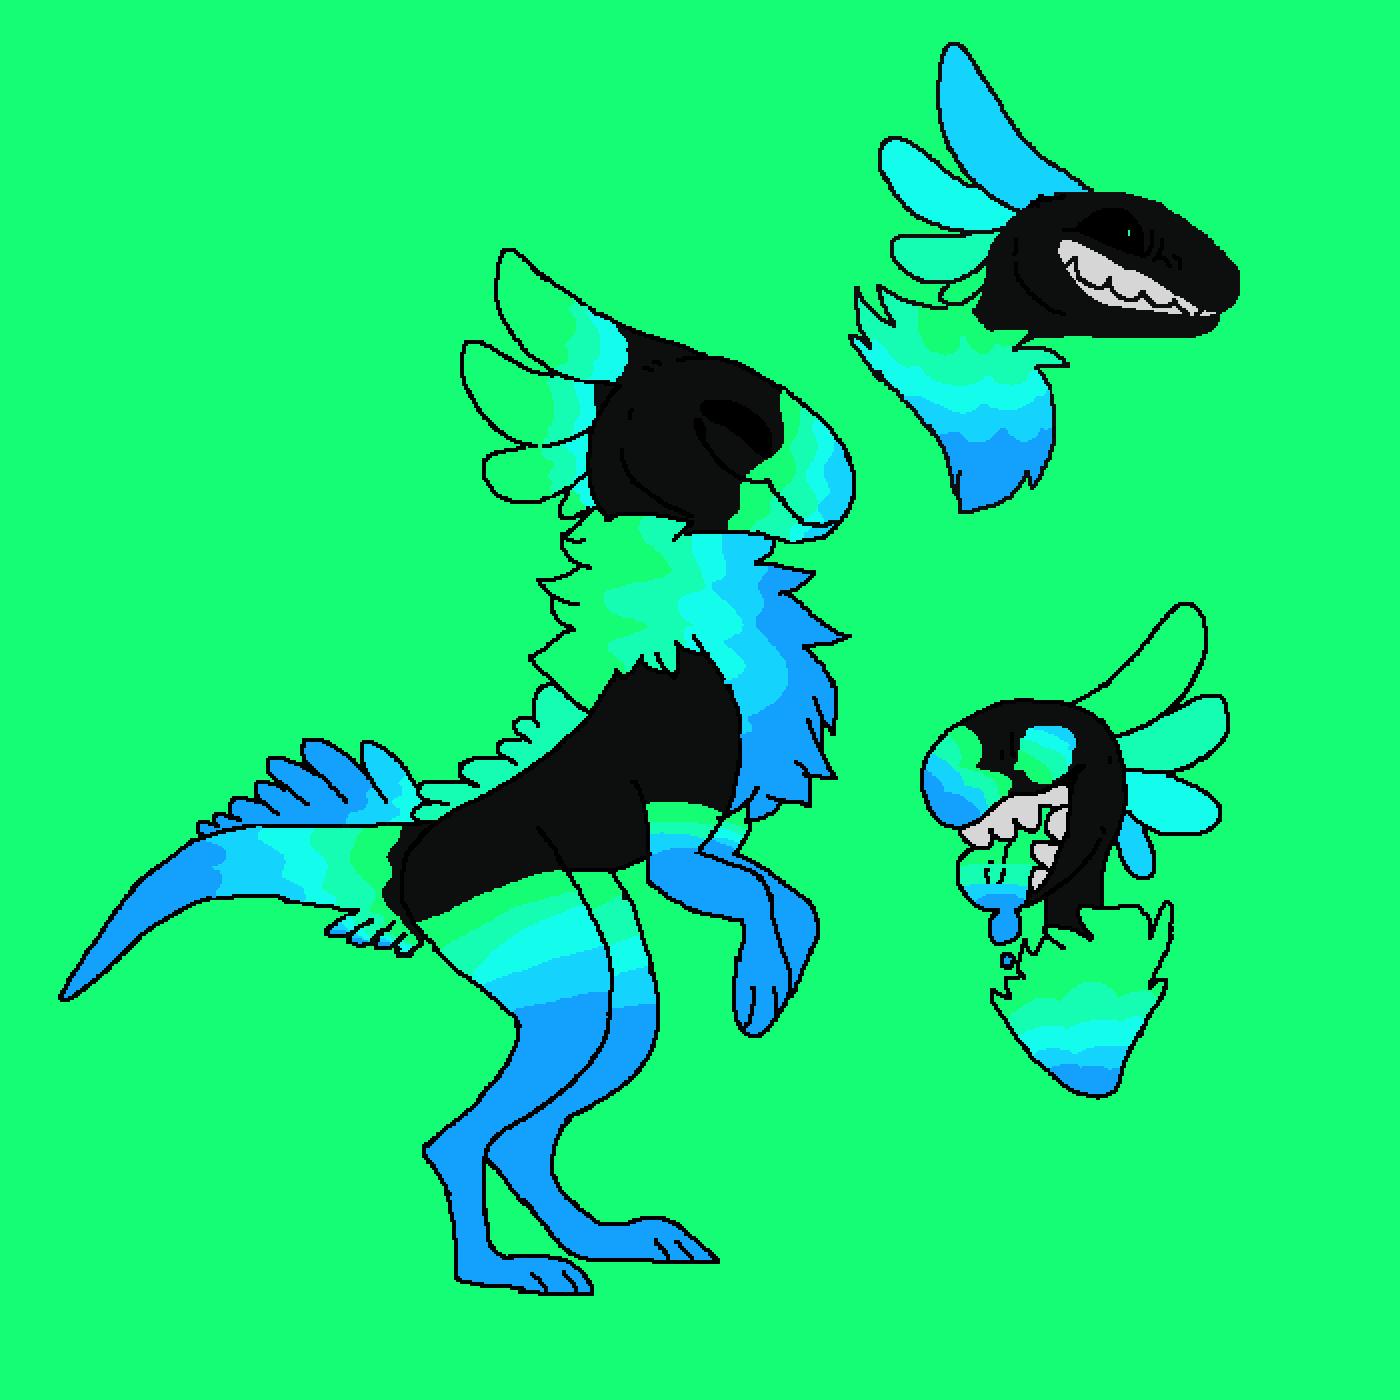 pixilart raptor oc by raindrops pixilart raptor oc by raindrops